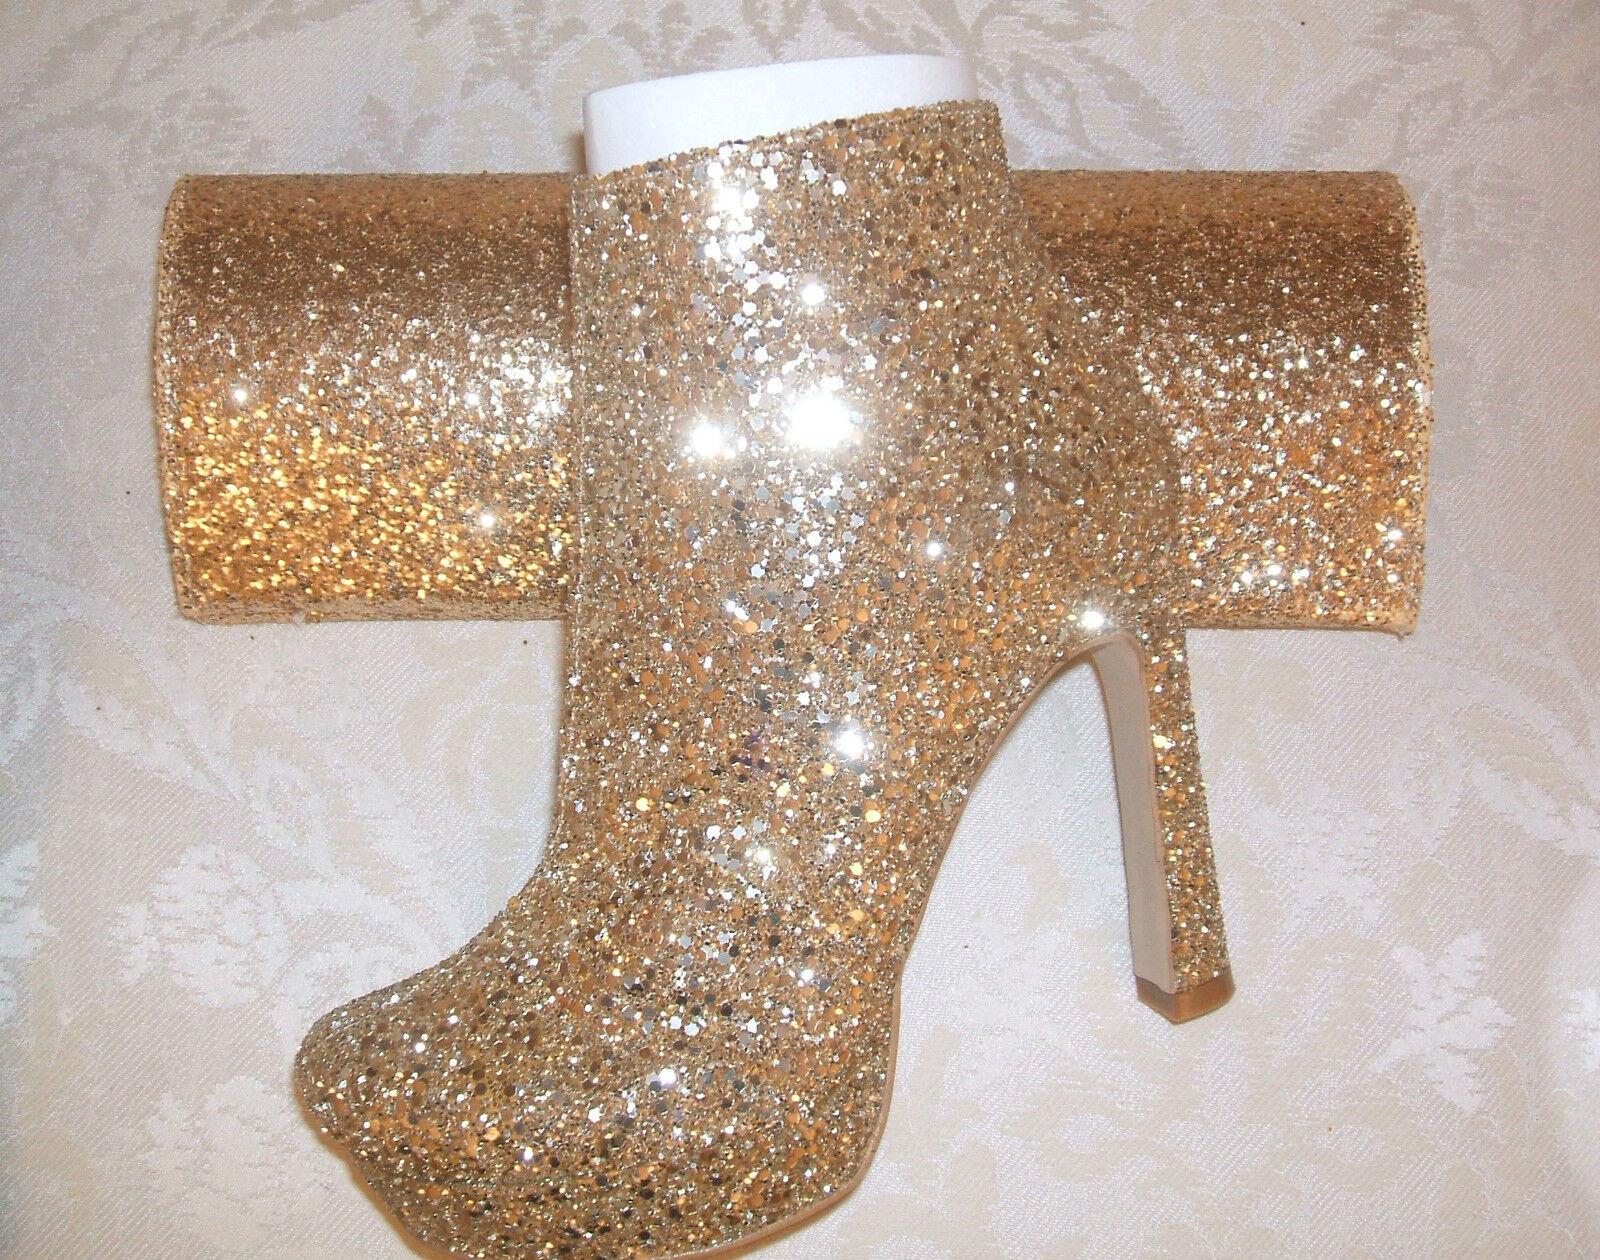 BNWB   DUNE SIZE 3 3.5 GLITTER 4 KLASSY D GOLD GLITTER 3.5 ANKLE Stiefel Schuhe BAG XTRA 4c64e4